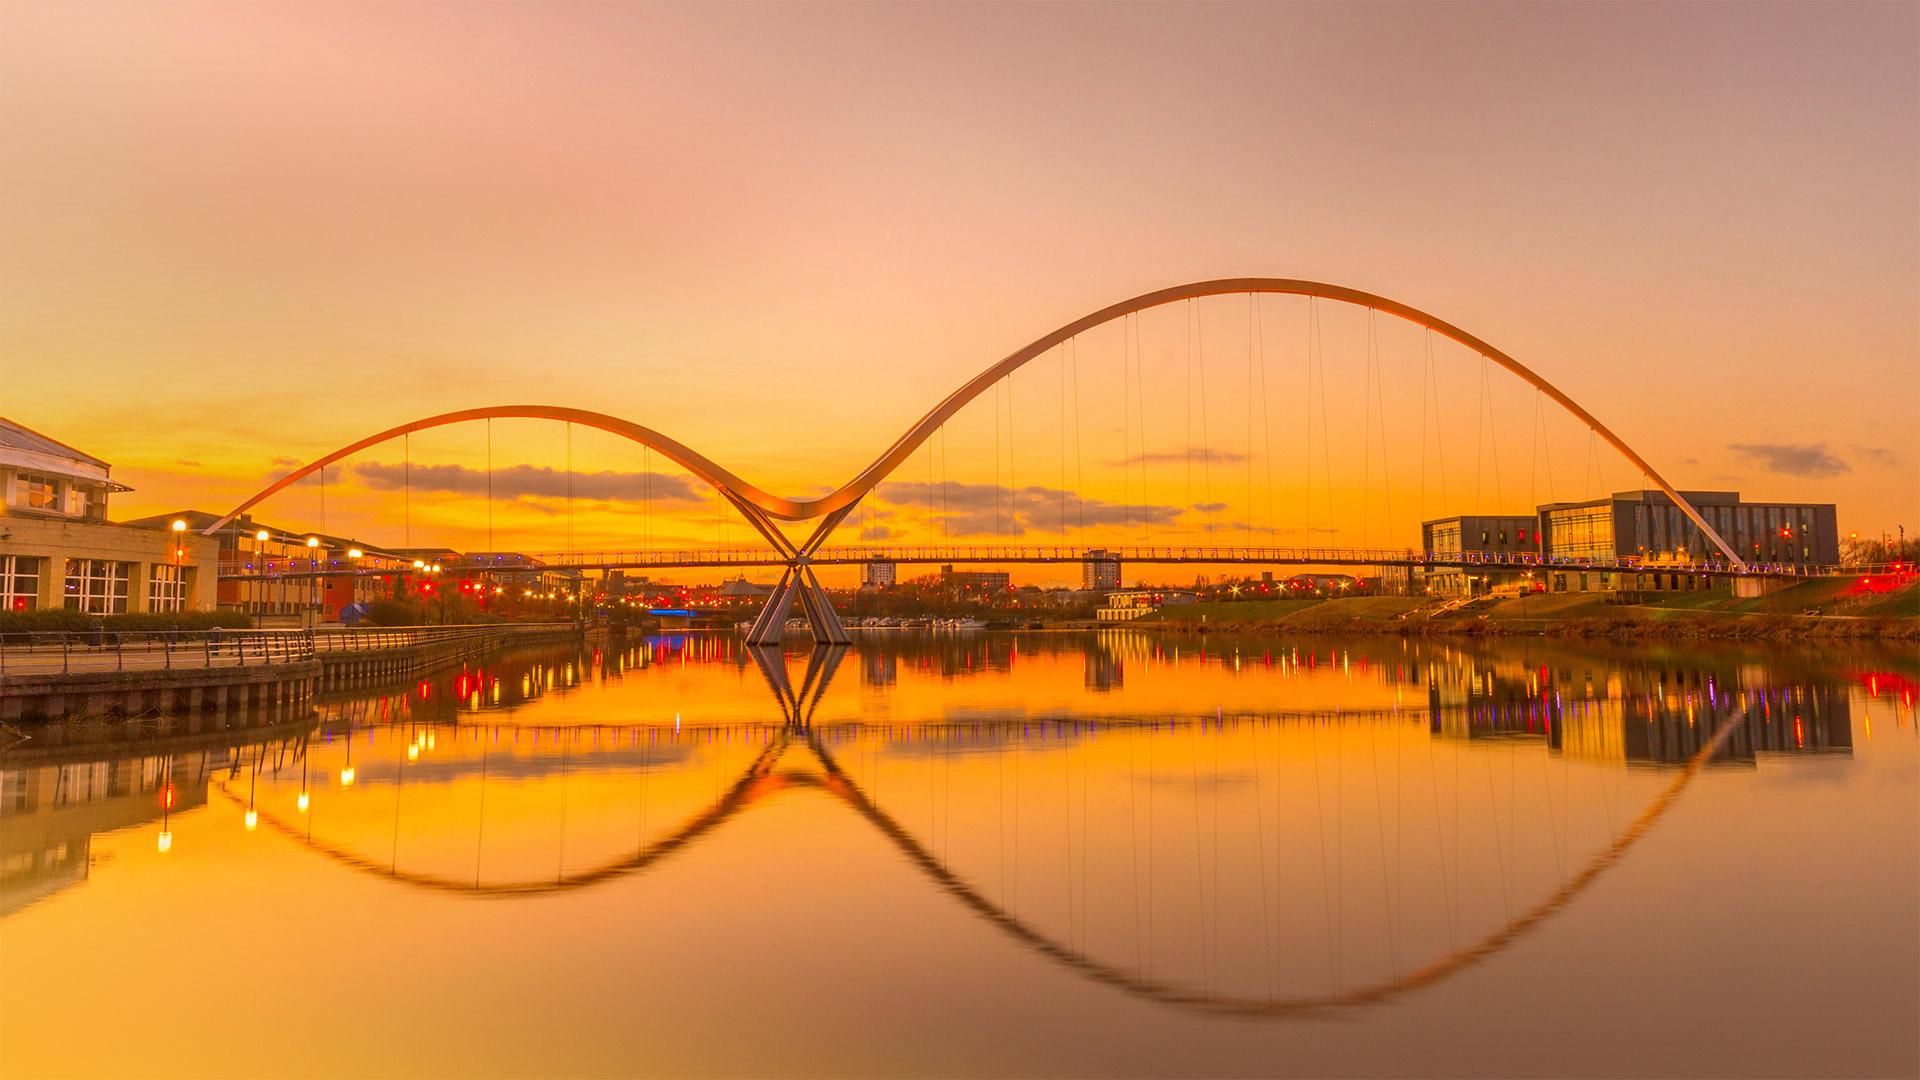 Infinity Bridge in Stockton-on-Tees, England (© Robert Smith/Alamy)(Bing United States)